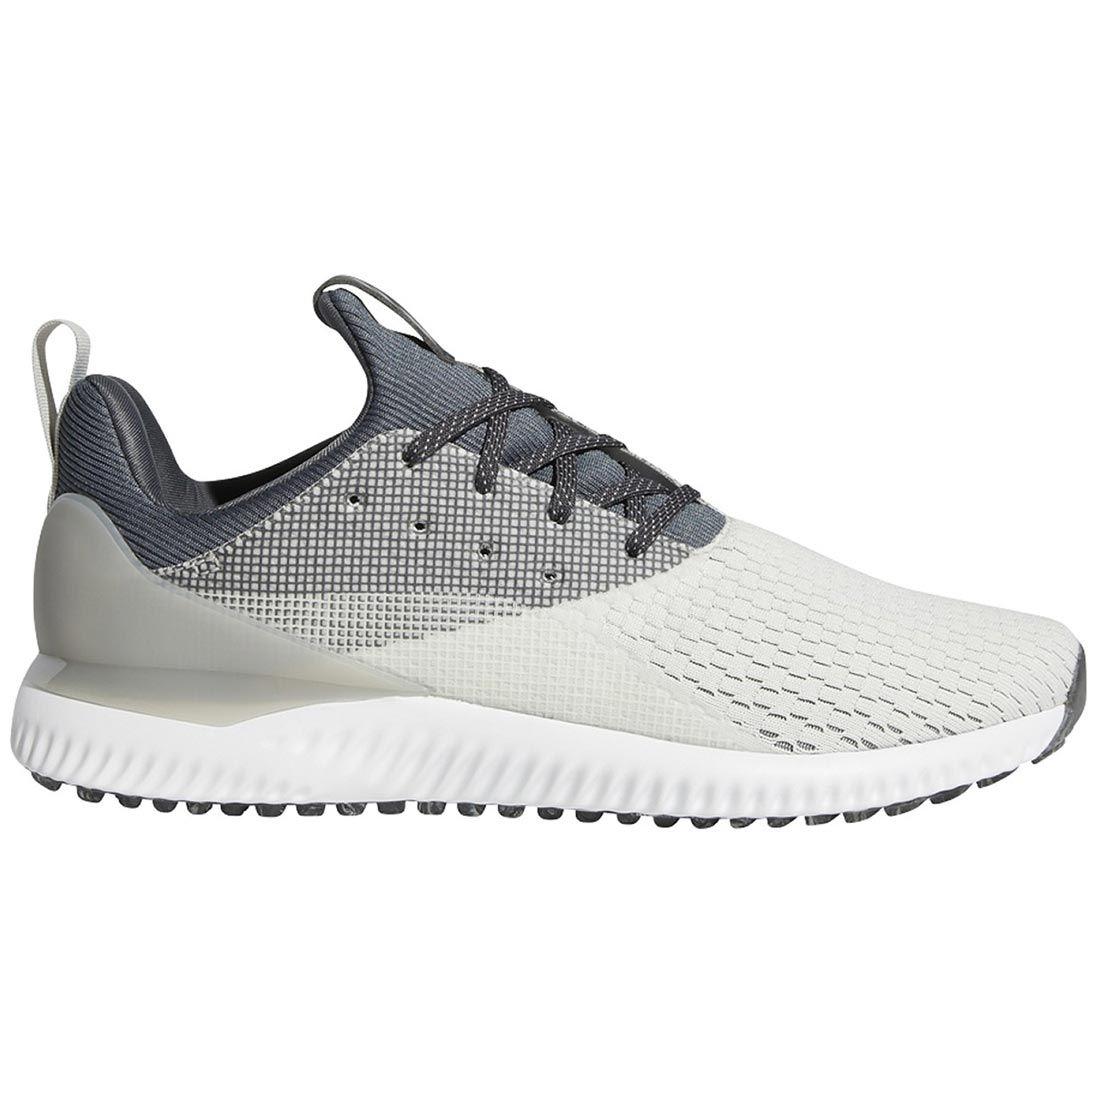 Buy Adidas Adicross Bounce 2.0 Golf